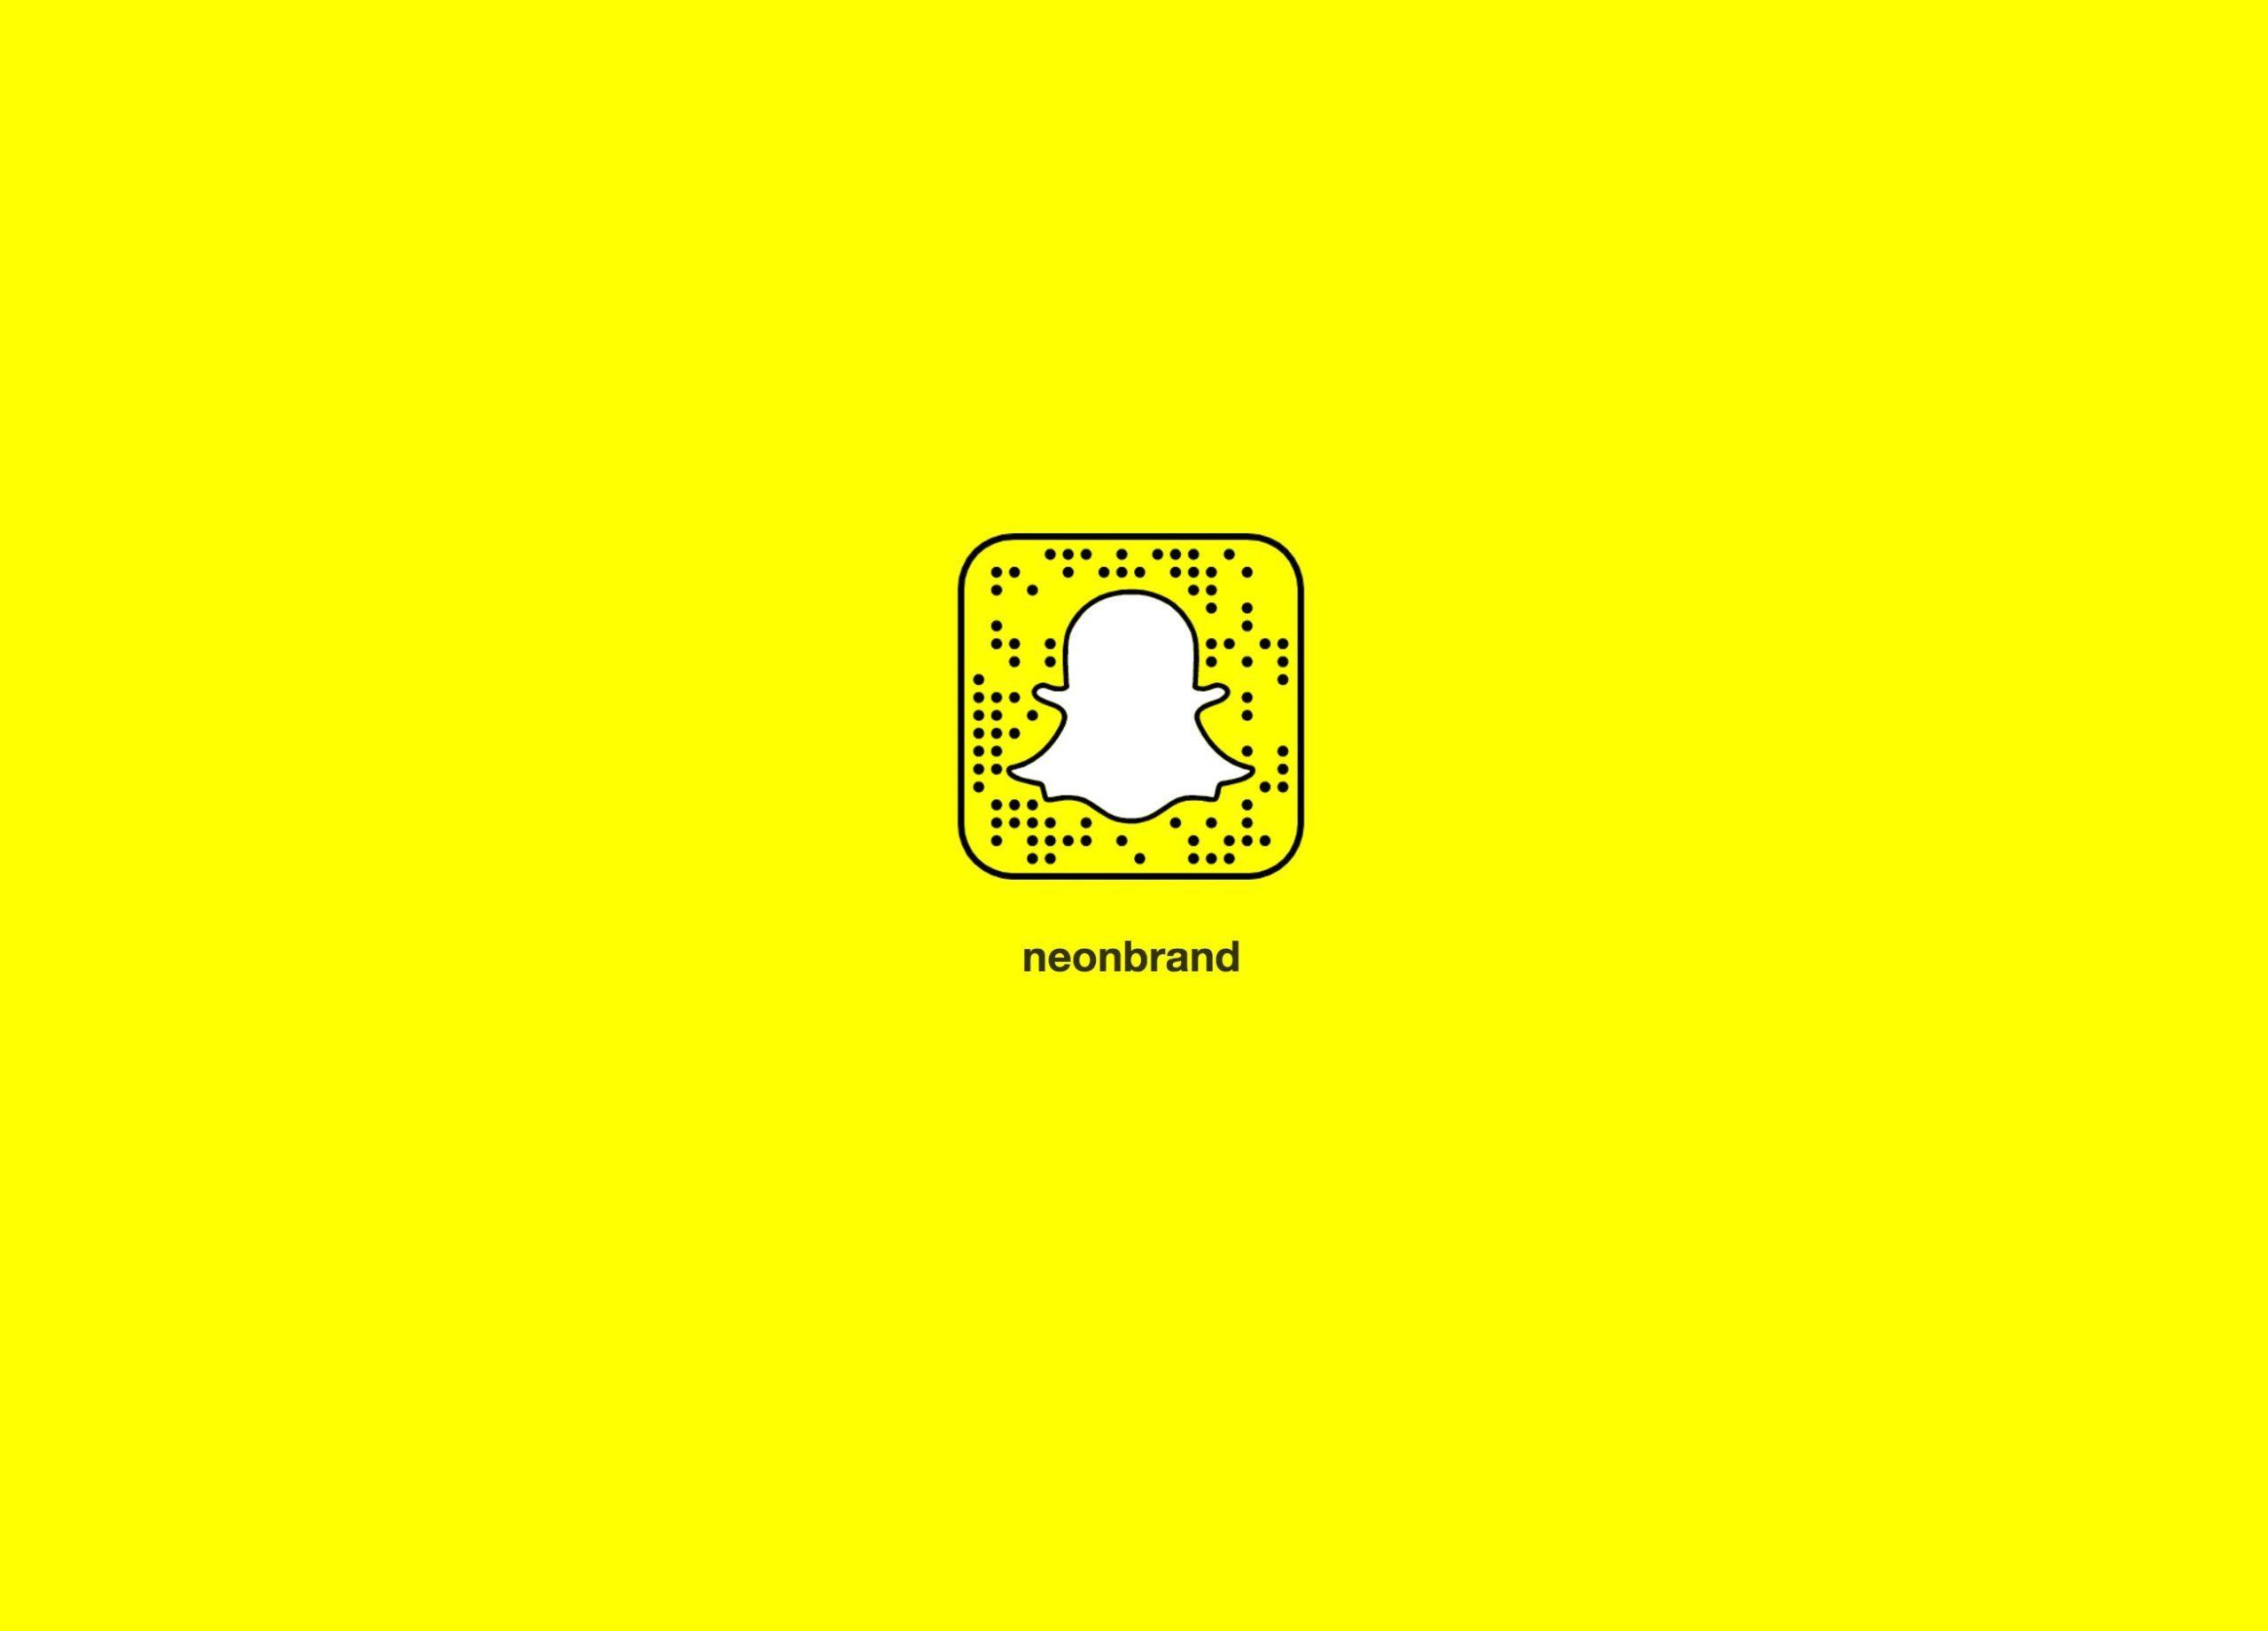 NeONBRAND Snapchat